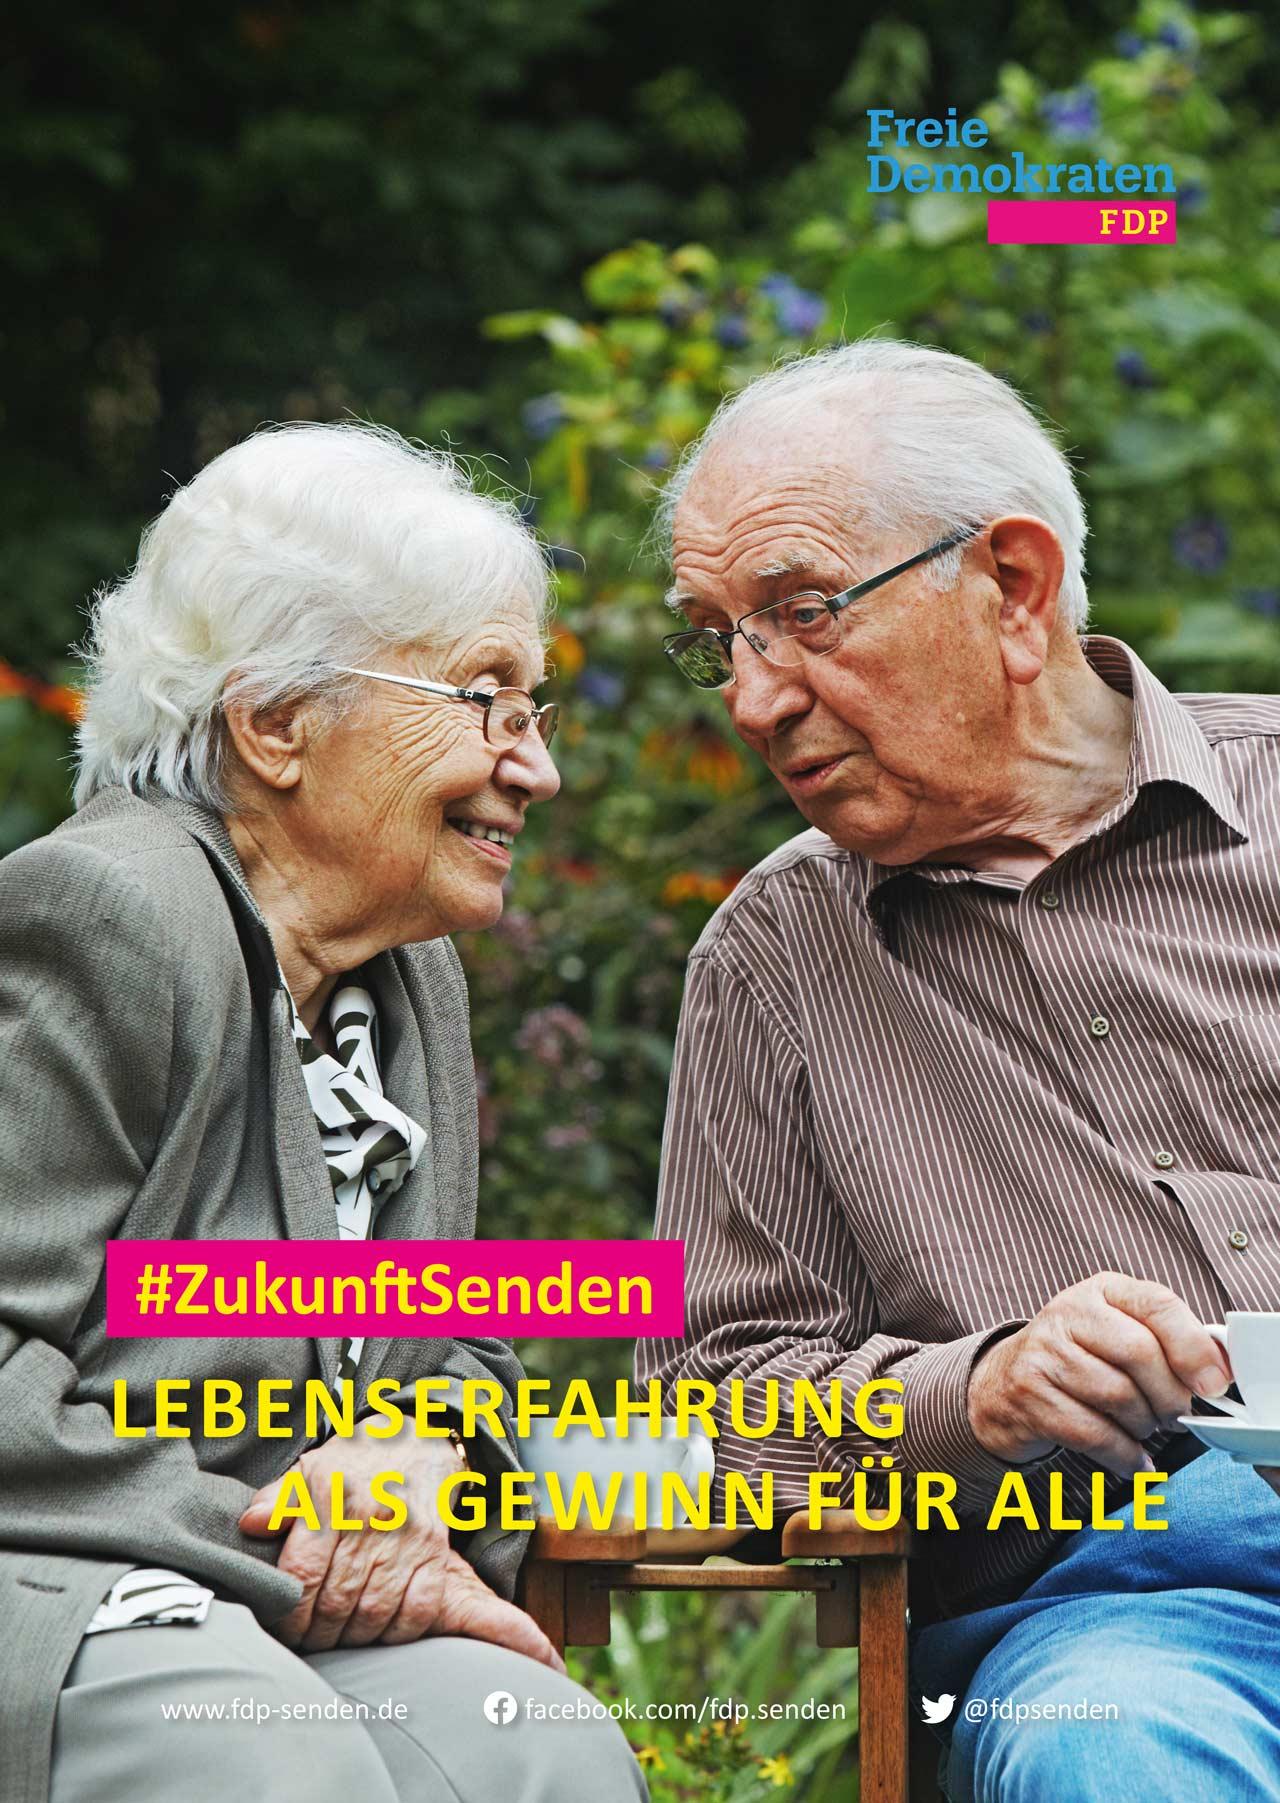 FDP-Senden_Wahlplakat-Lebenserfahrung